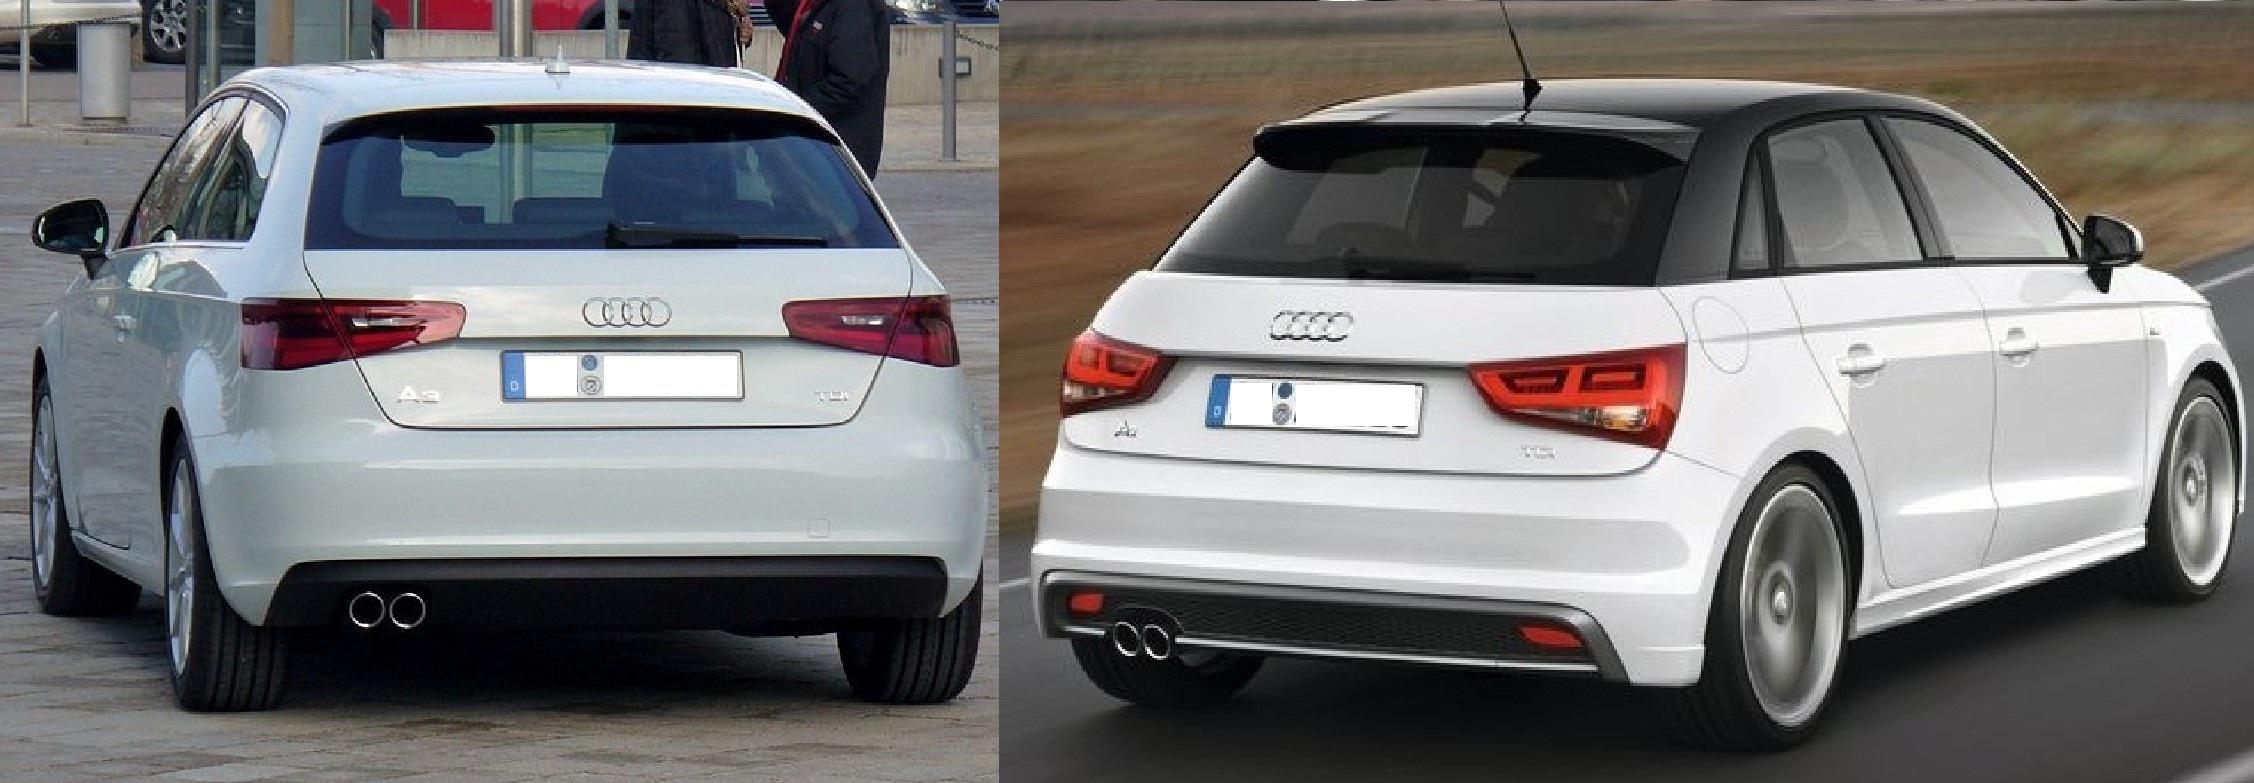 Audi A1 Vs A3 Auto Cars